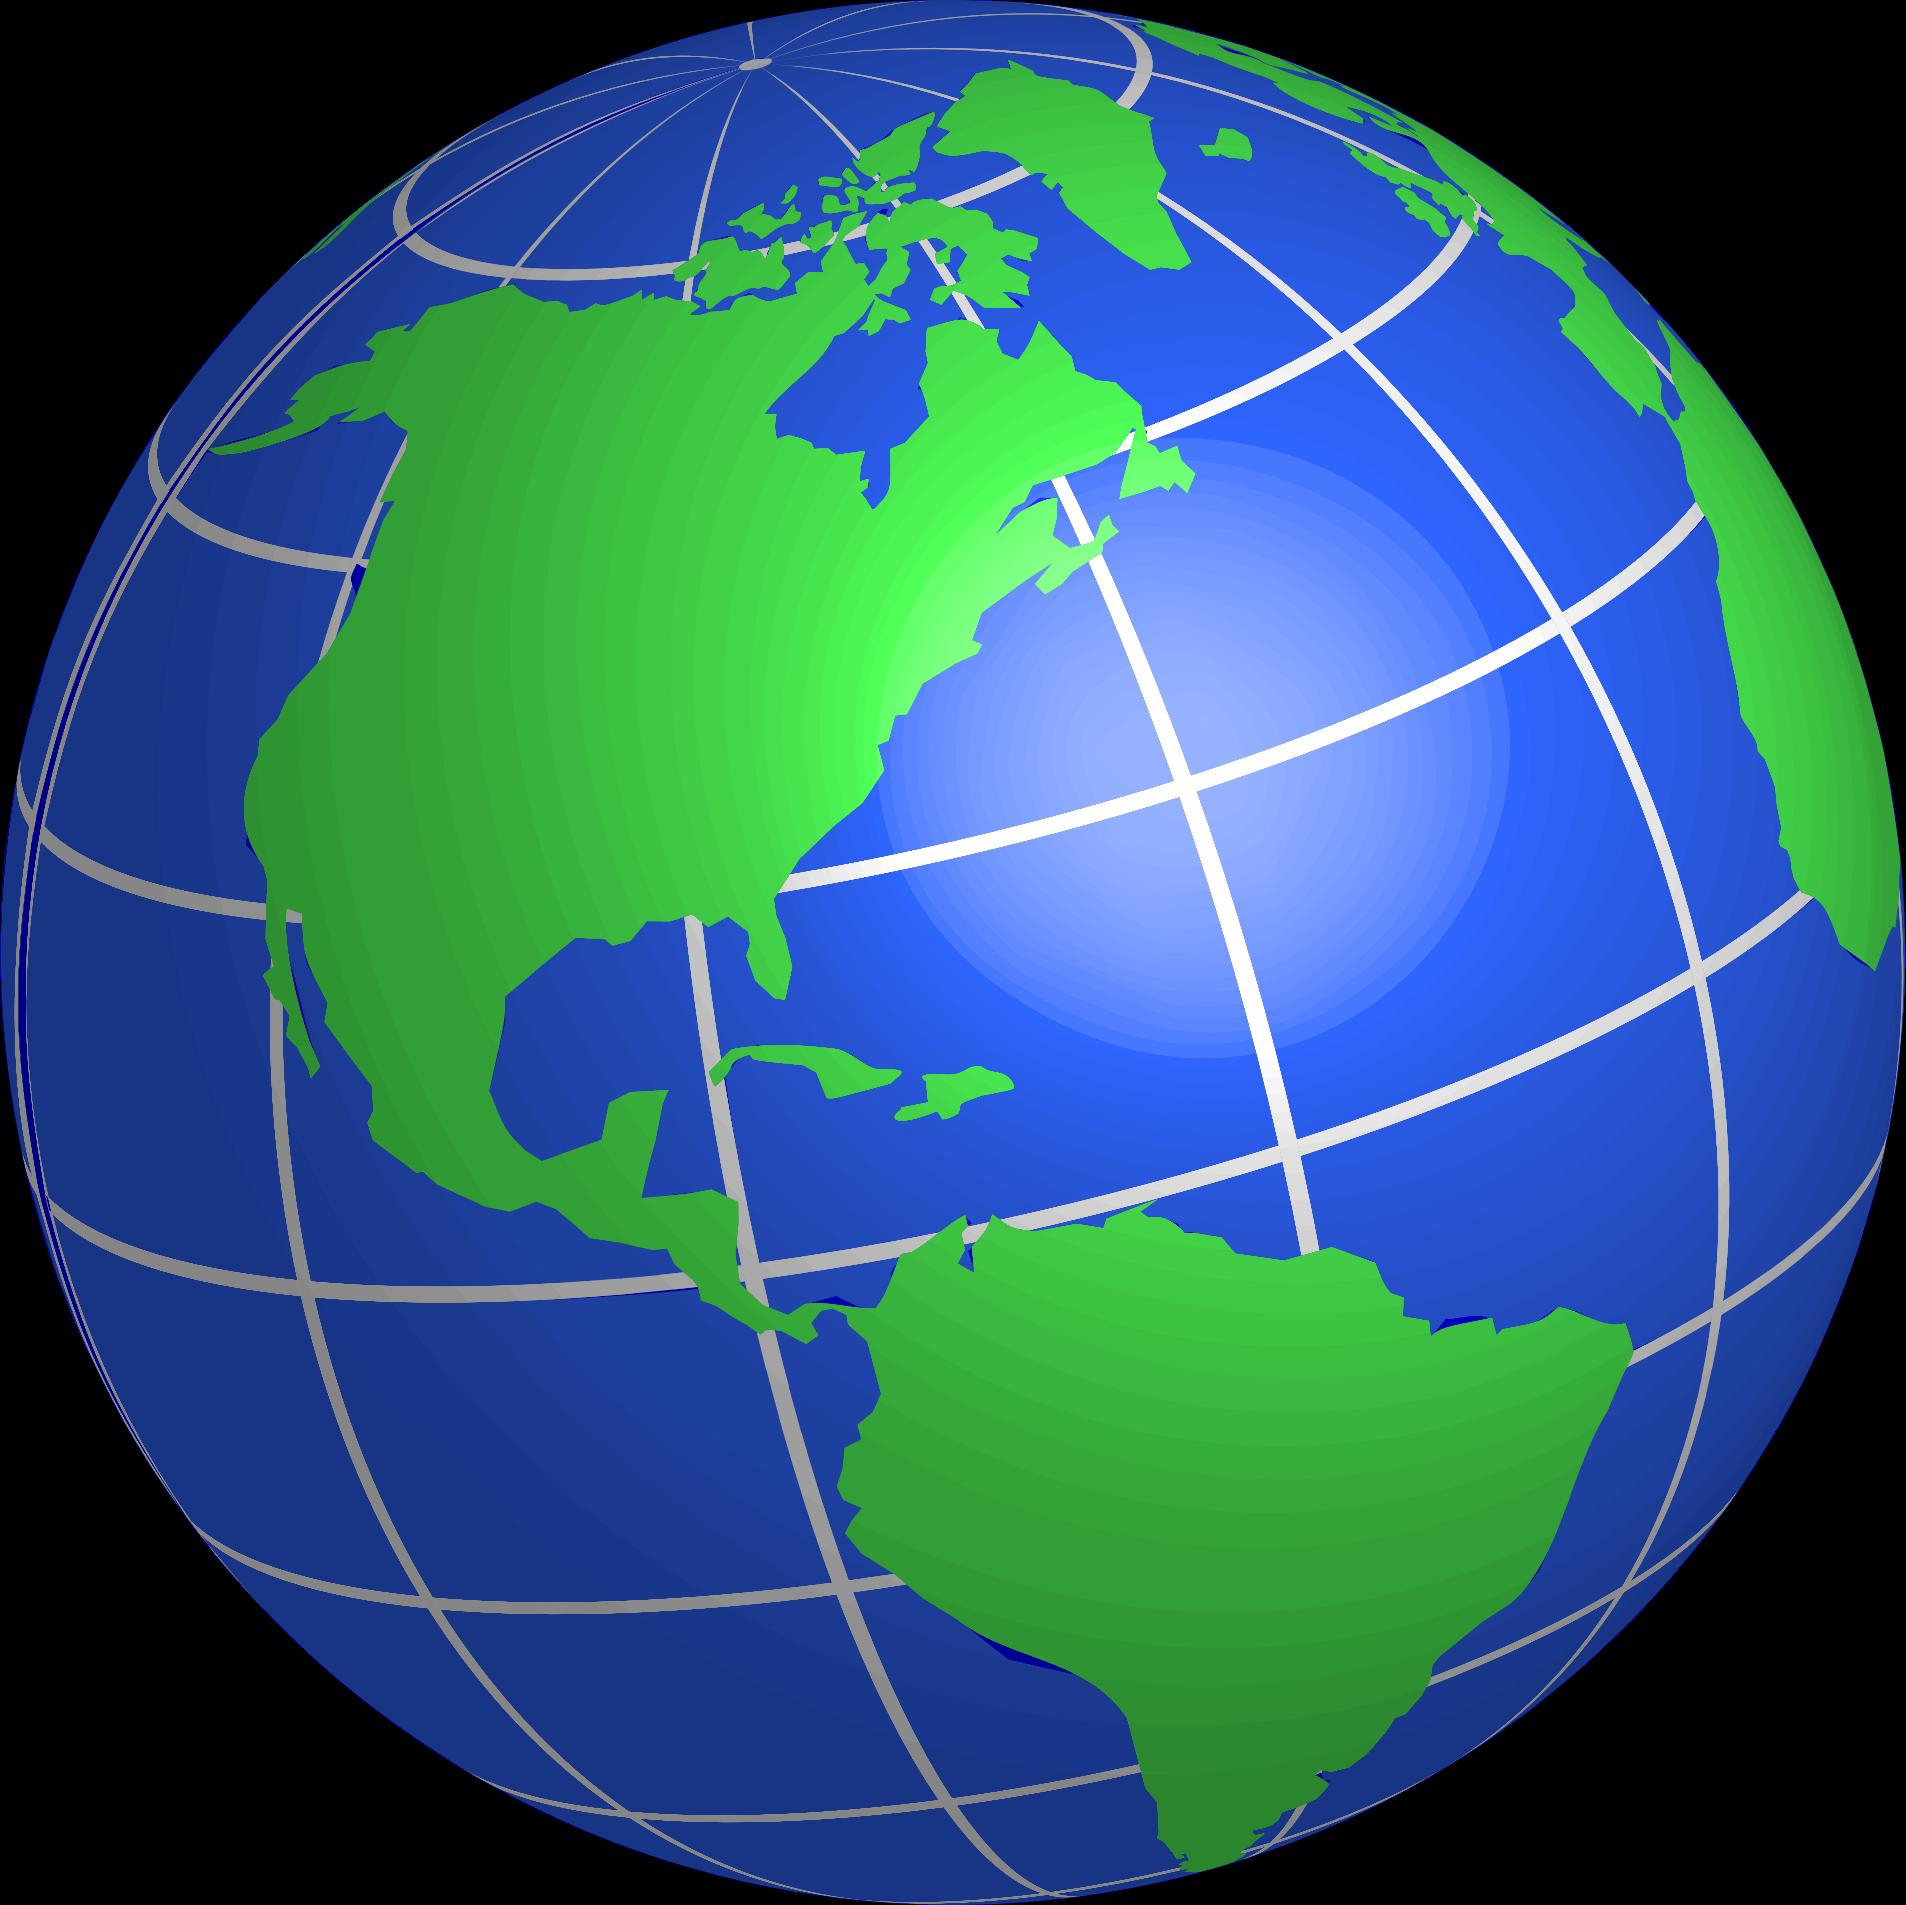 Mac Copy Shortcut Clipart North And South American Globe